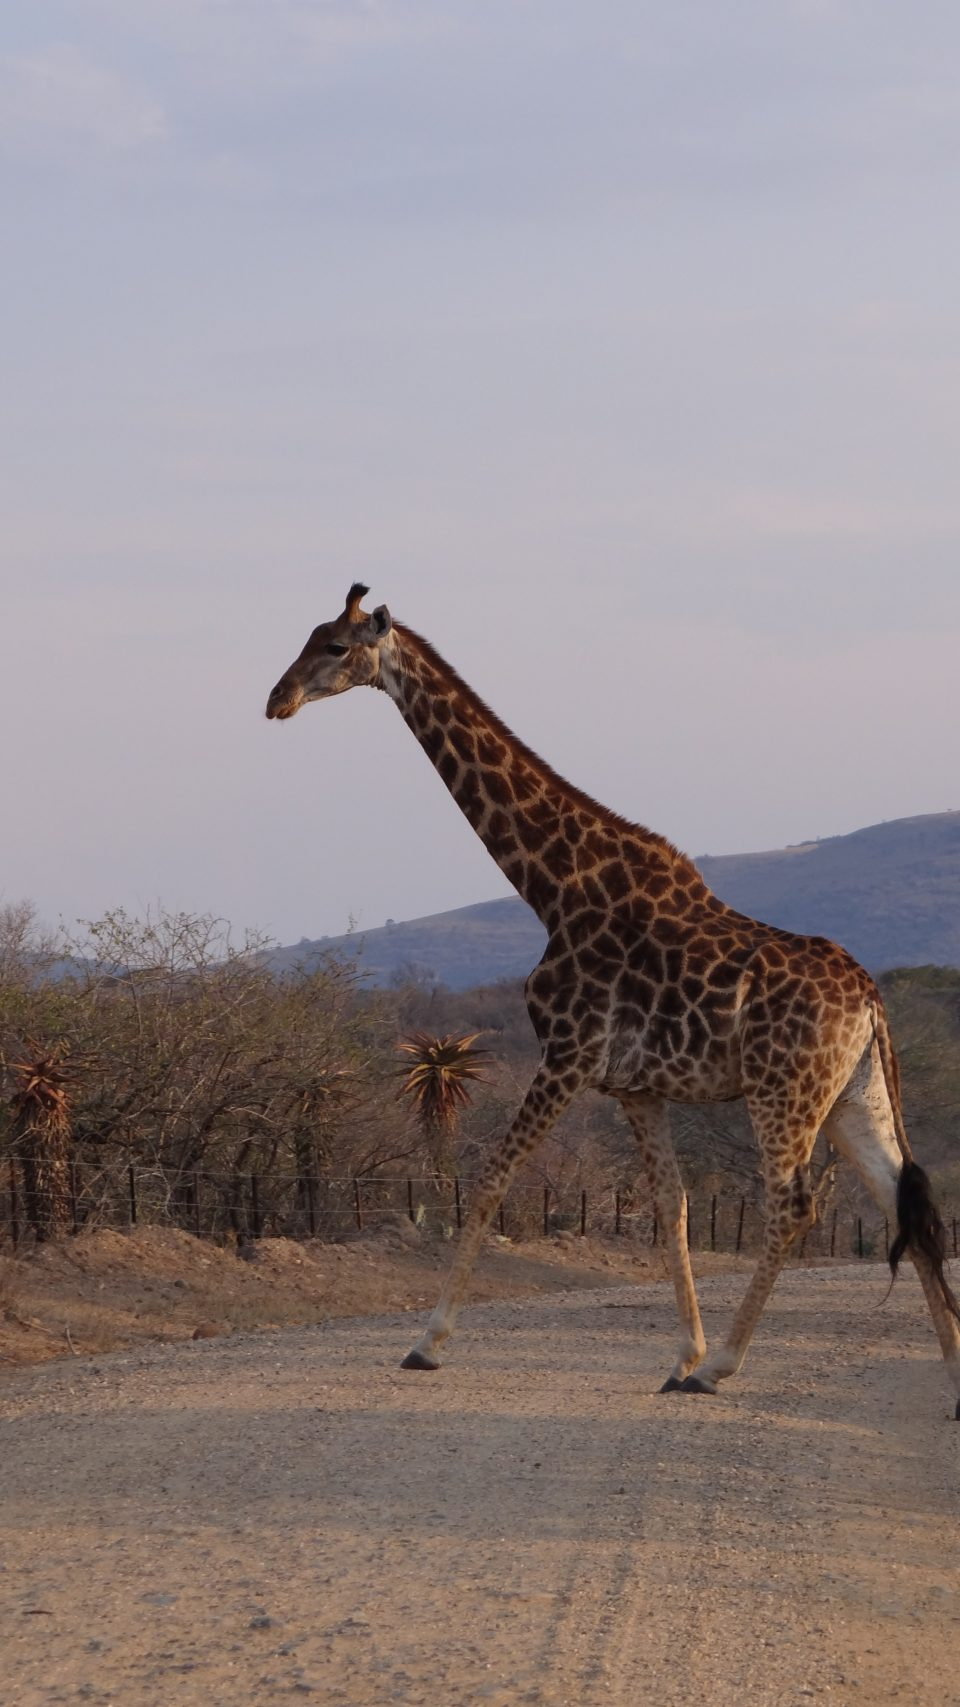 Giraffe Emakhosini Ophathe Heritage Park